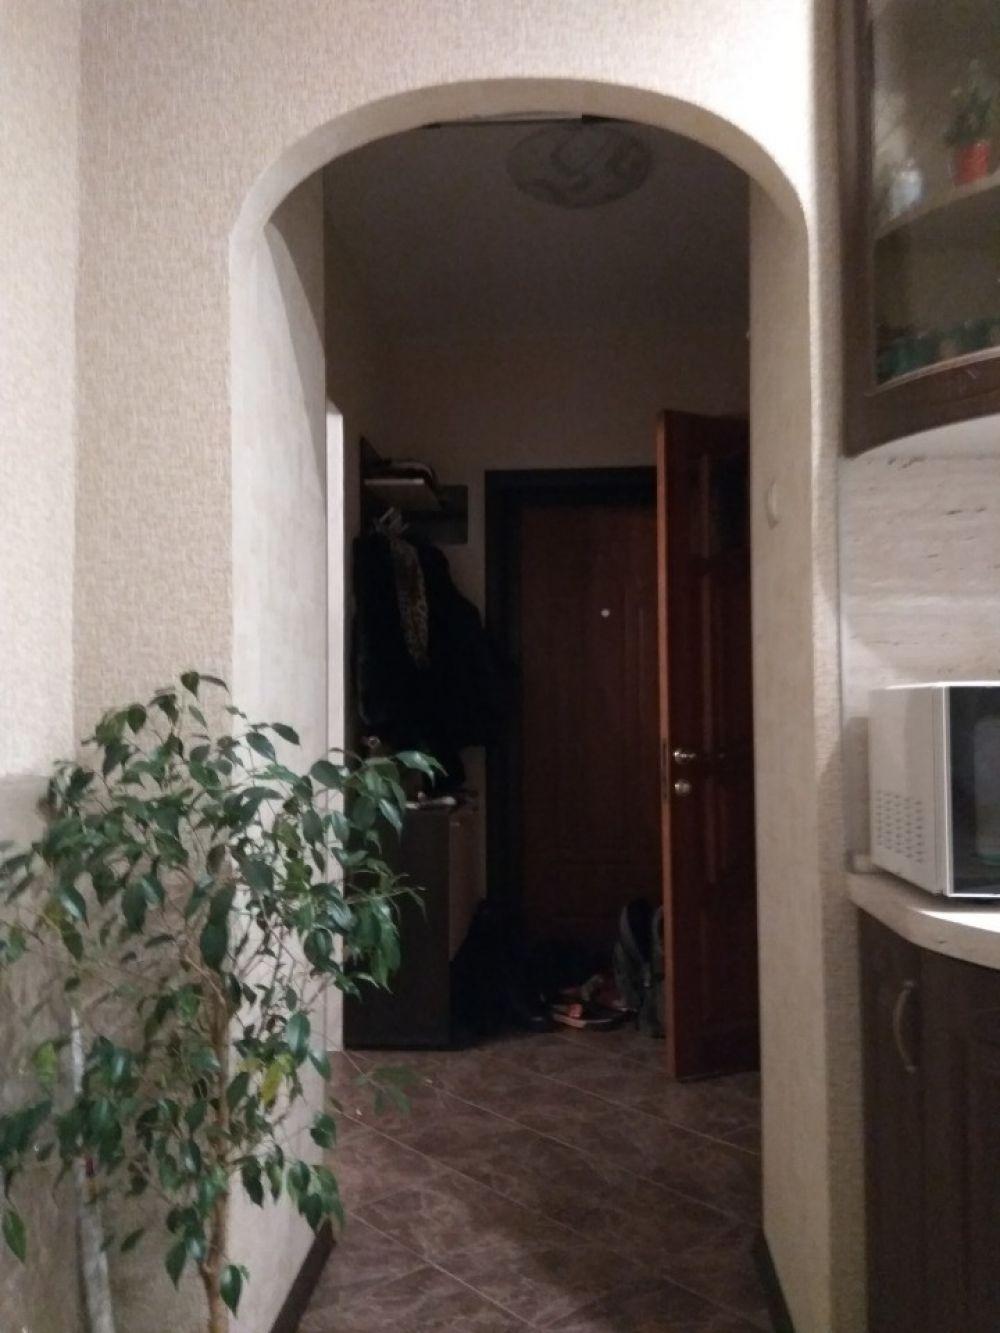 Однокомнатная квартира п.Свердловский ЖК Свердловский ул.Михаила Марченкод.12, фото 2